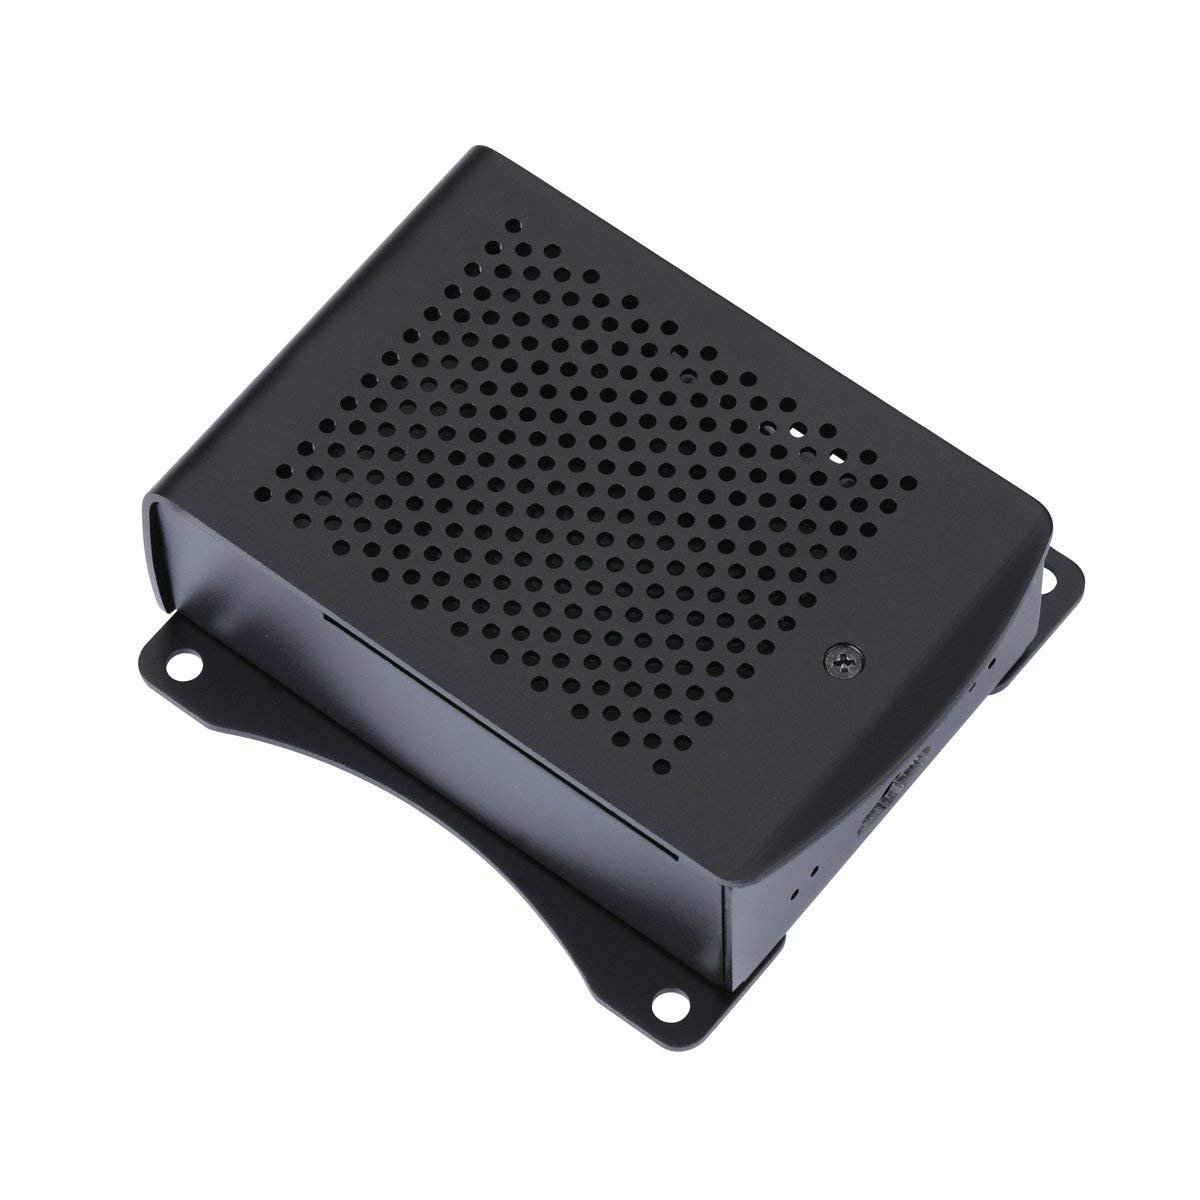 Amazon.com: Raspberry Pi B+ 2B 3B 3B + carcasa de aluminio ...